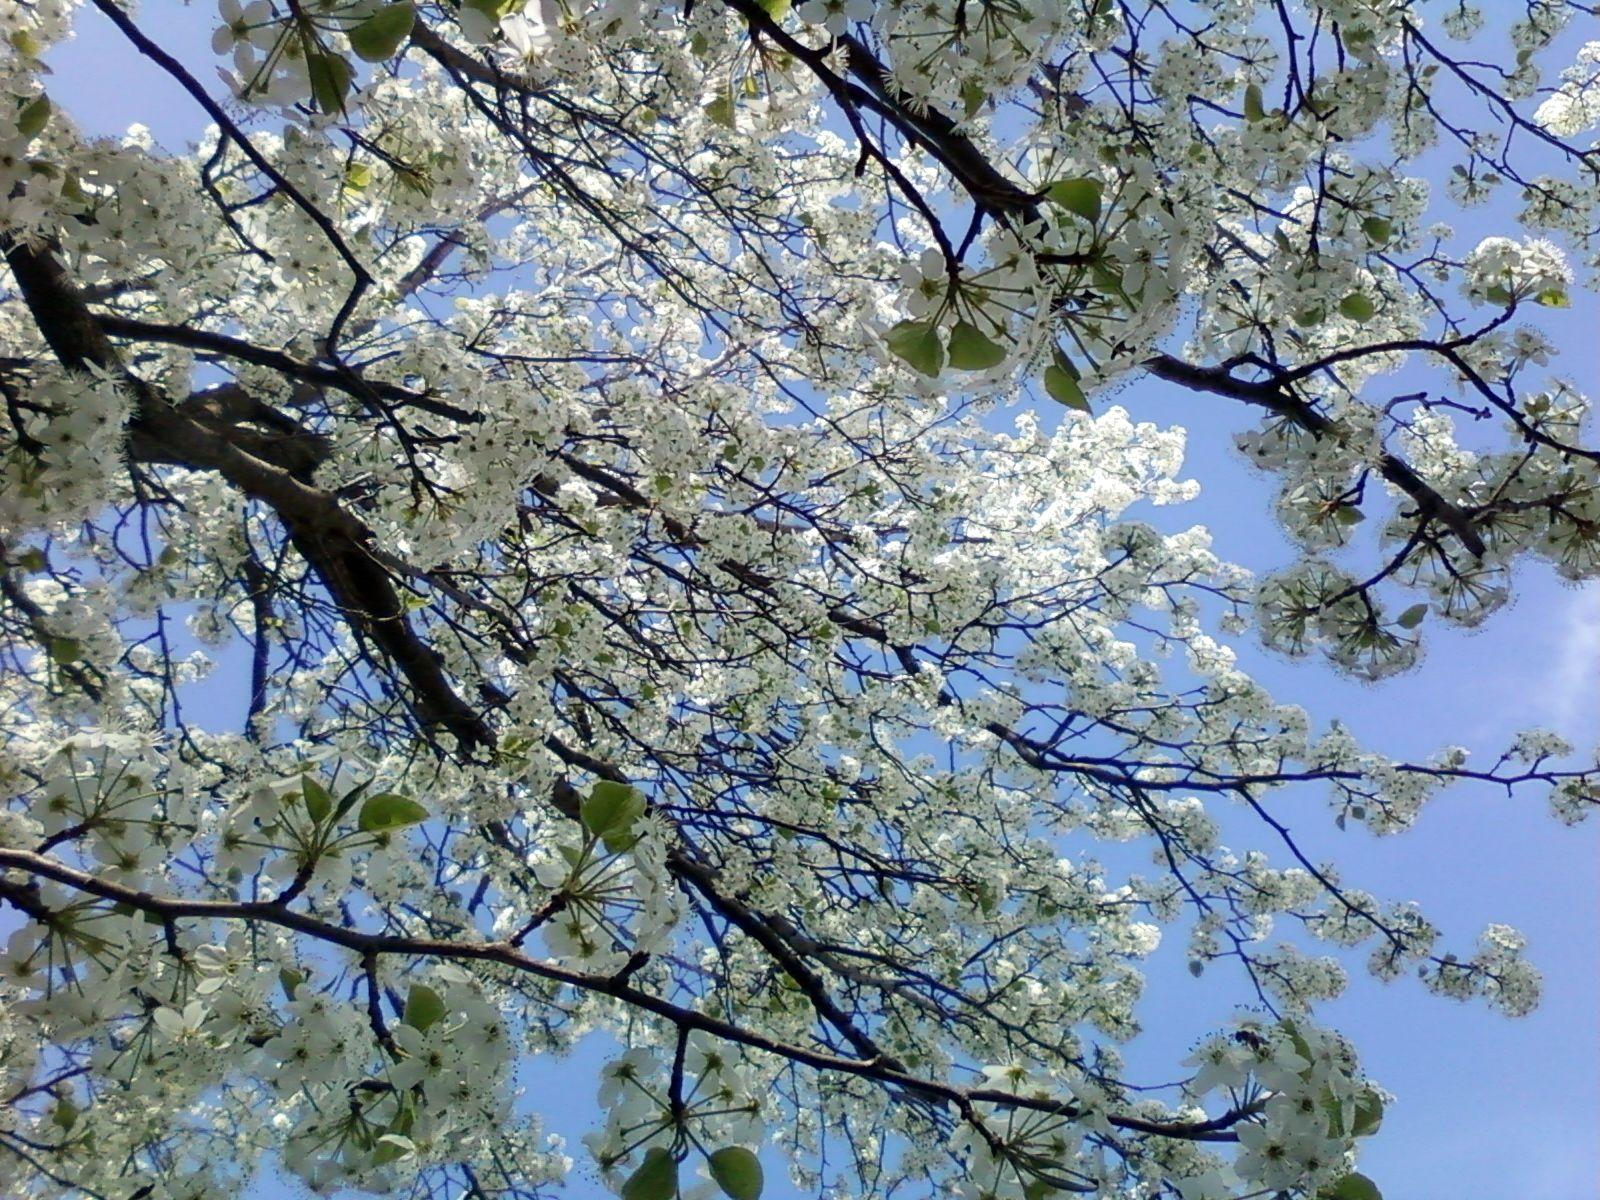 Bradford Pear in bloom